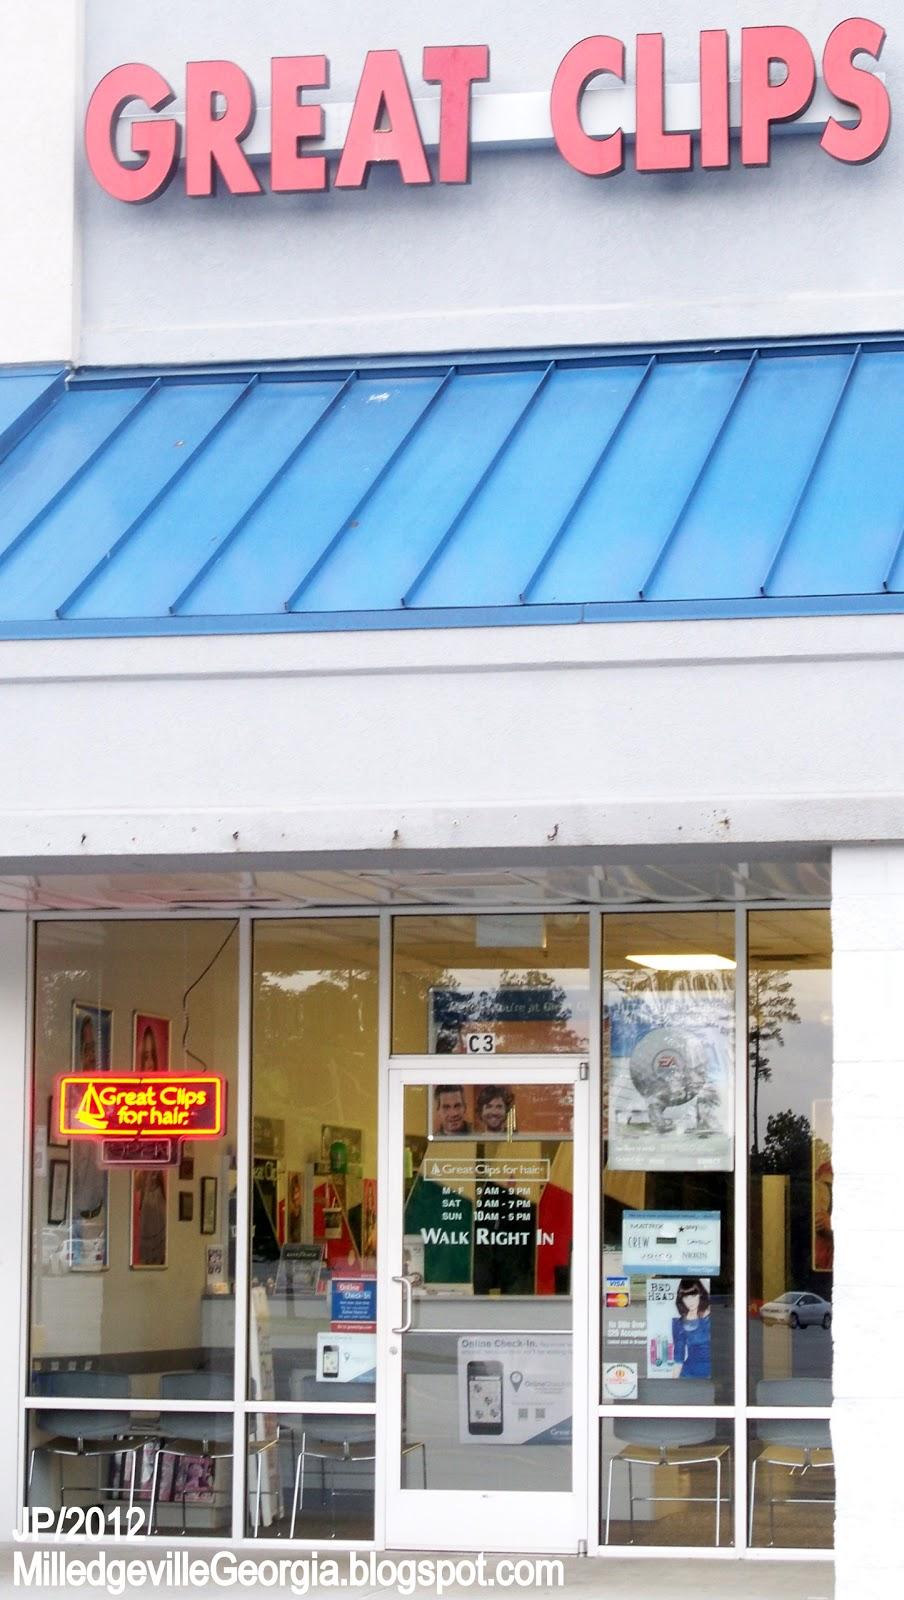 Barber Shop In Walmart : ... Barber+Shop+Baldwin+County+Milledgeville+GA.+WalMart+Shopping+Center